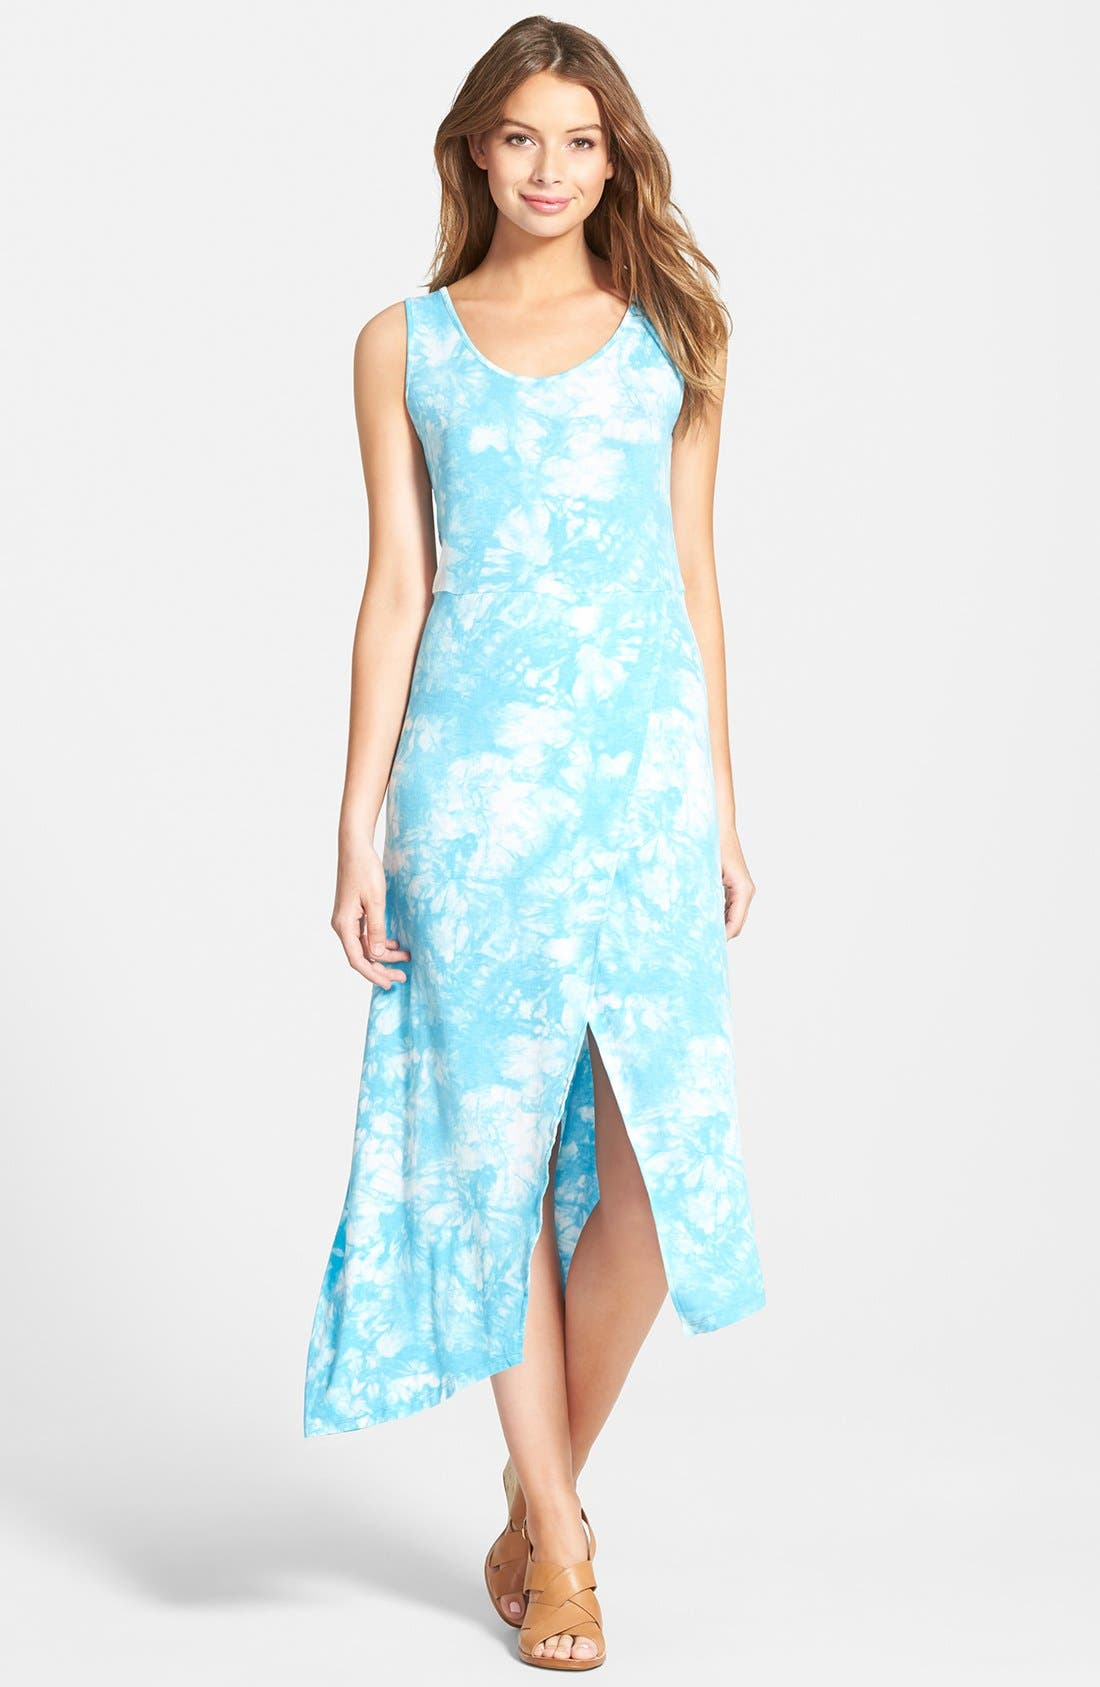 Main Image - kensie 'Burst' Tie Dye Maxi Dress